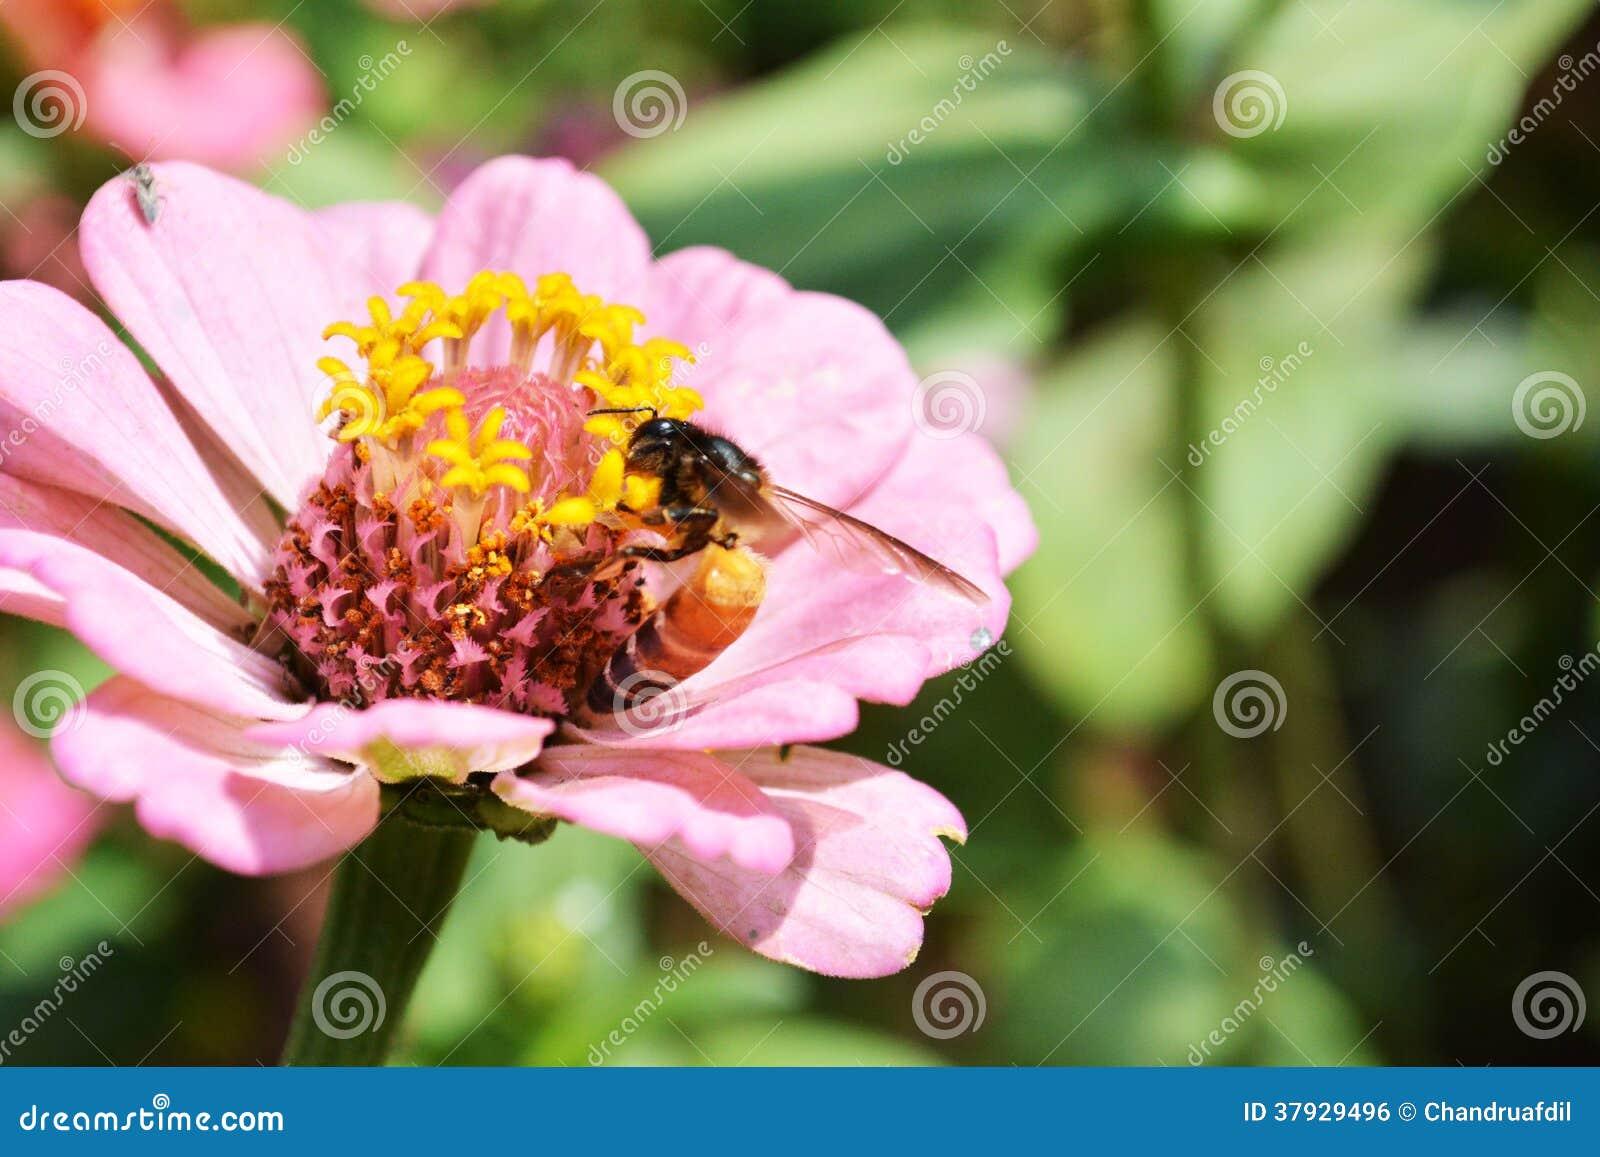 Zinnia flower8